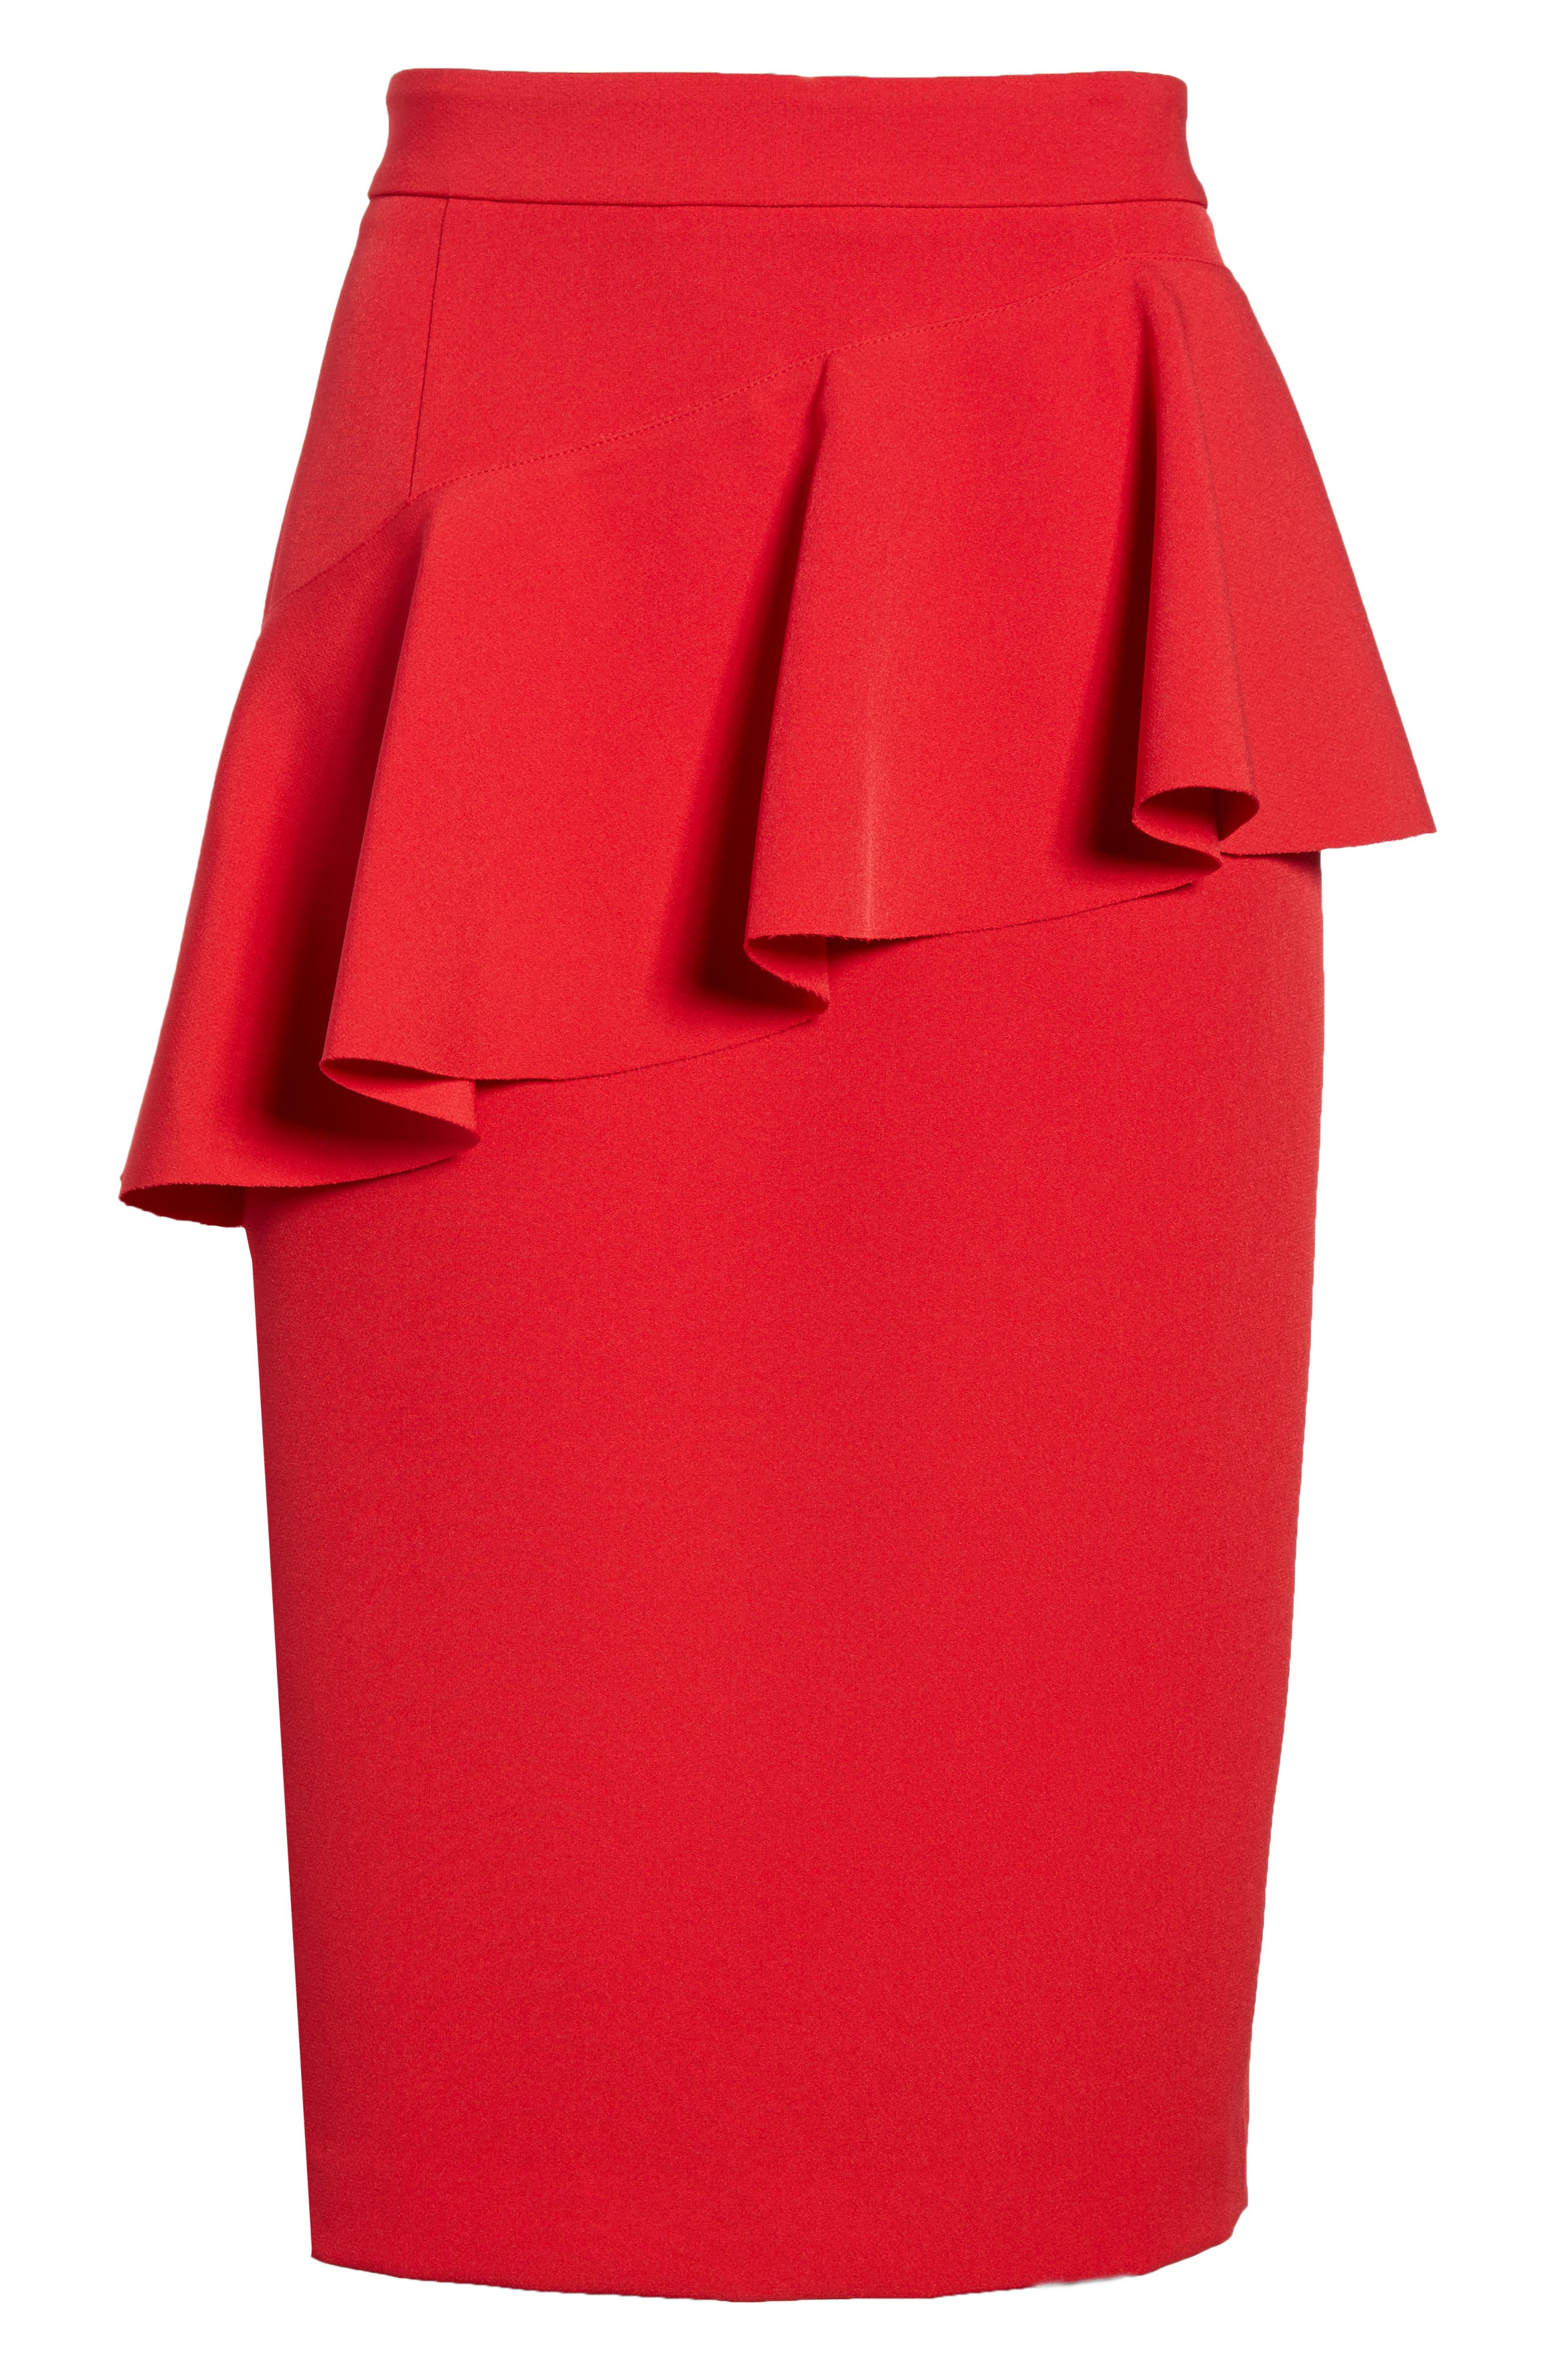 Ruffle Detail Pencil Skirt,                             Alternate thumbnail 12, color,